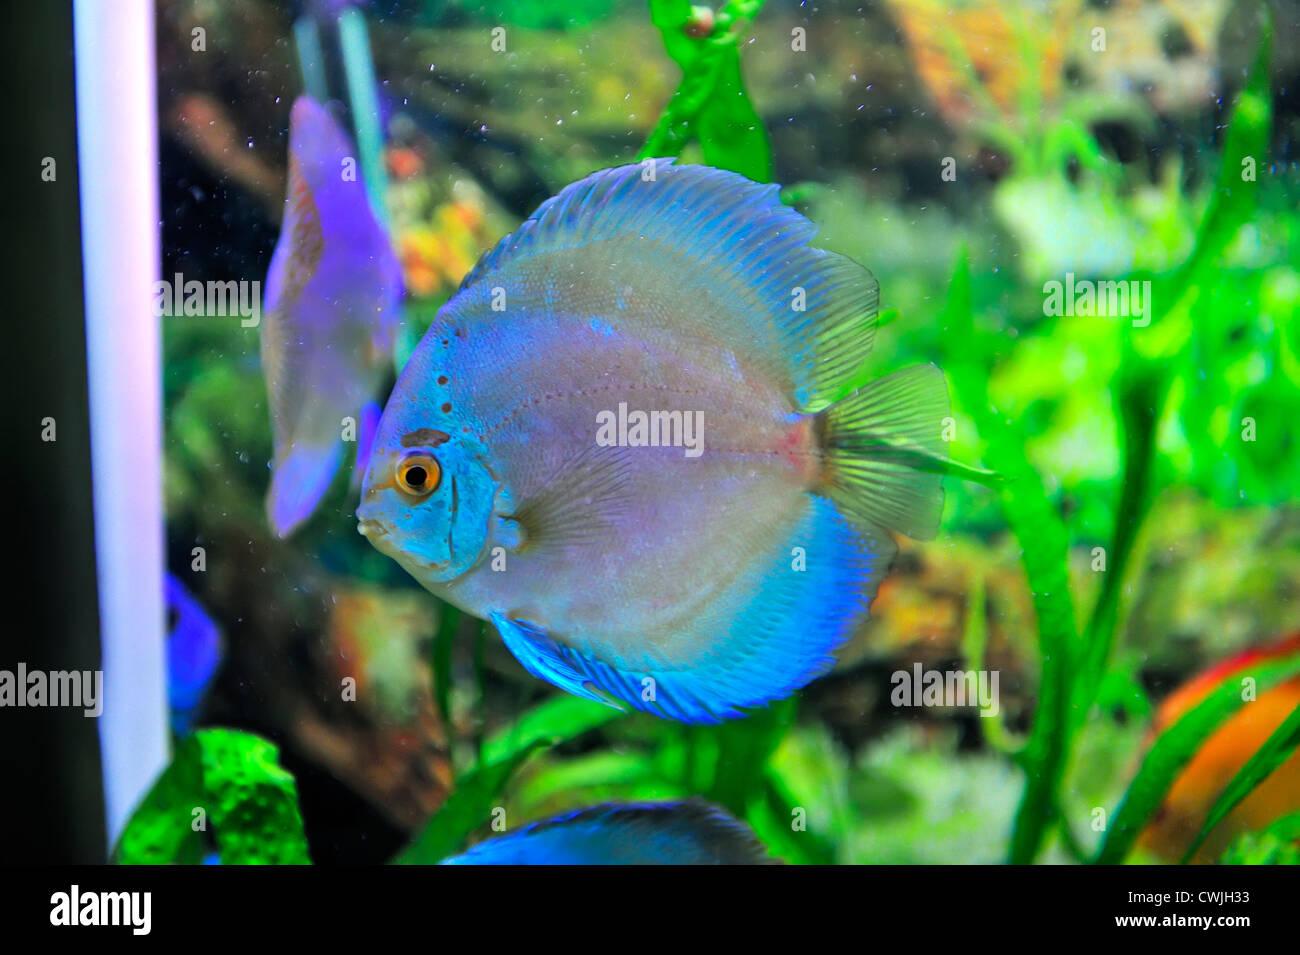 Discus Fish Stock Photos & Discus Fish Stock Images - Alamy